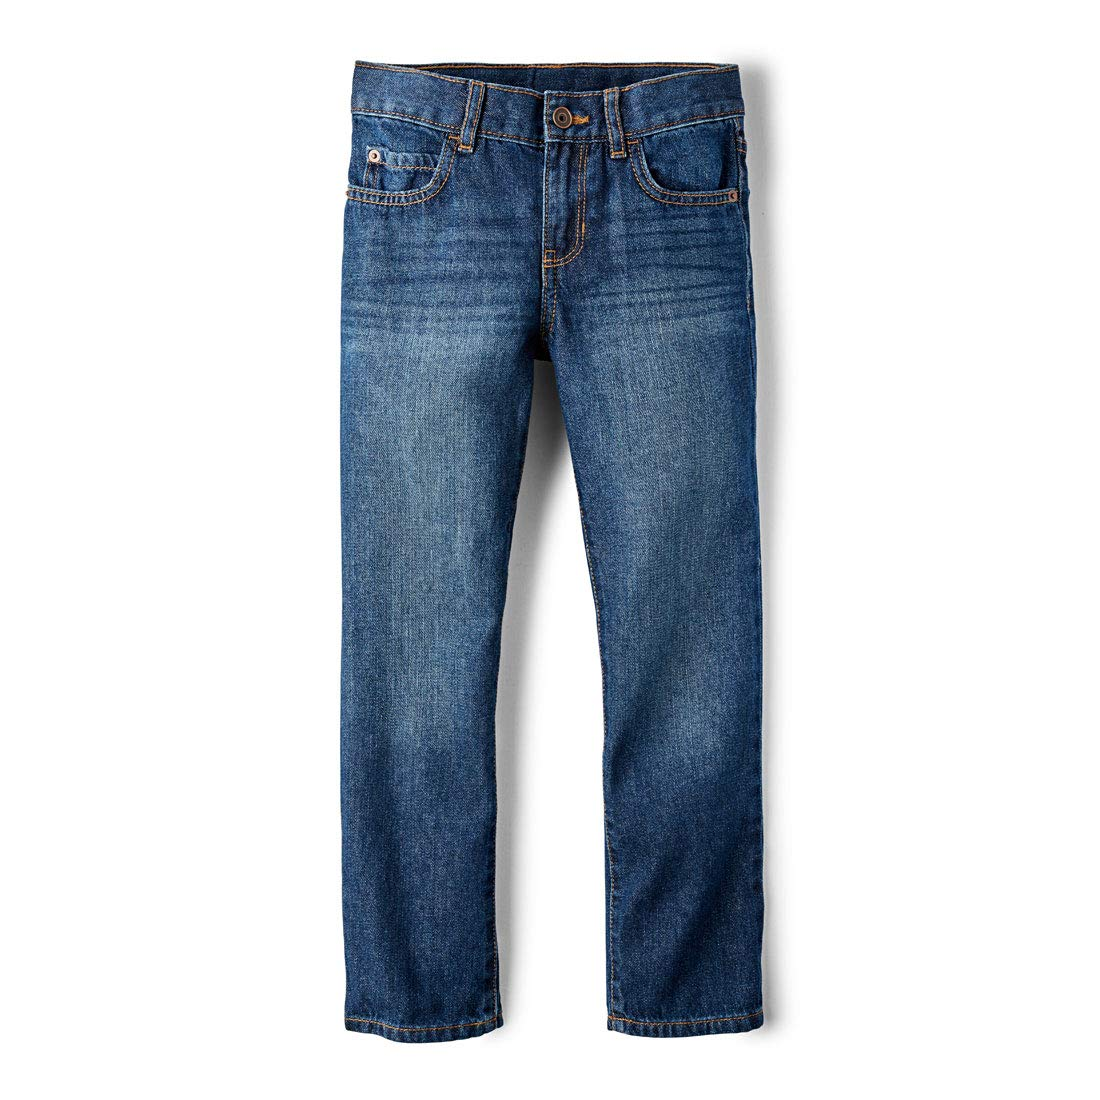 The Children's Place Big Boys' Straight Leg Jeans, DK Jupiter 5867,8 by The Children's Place